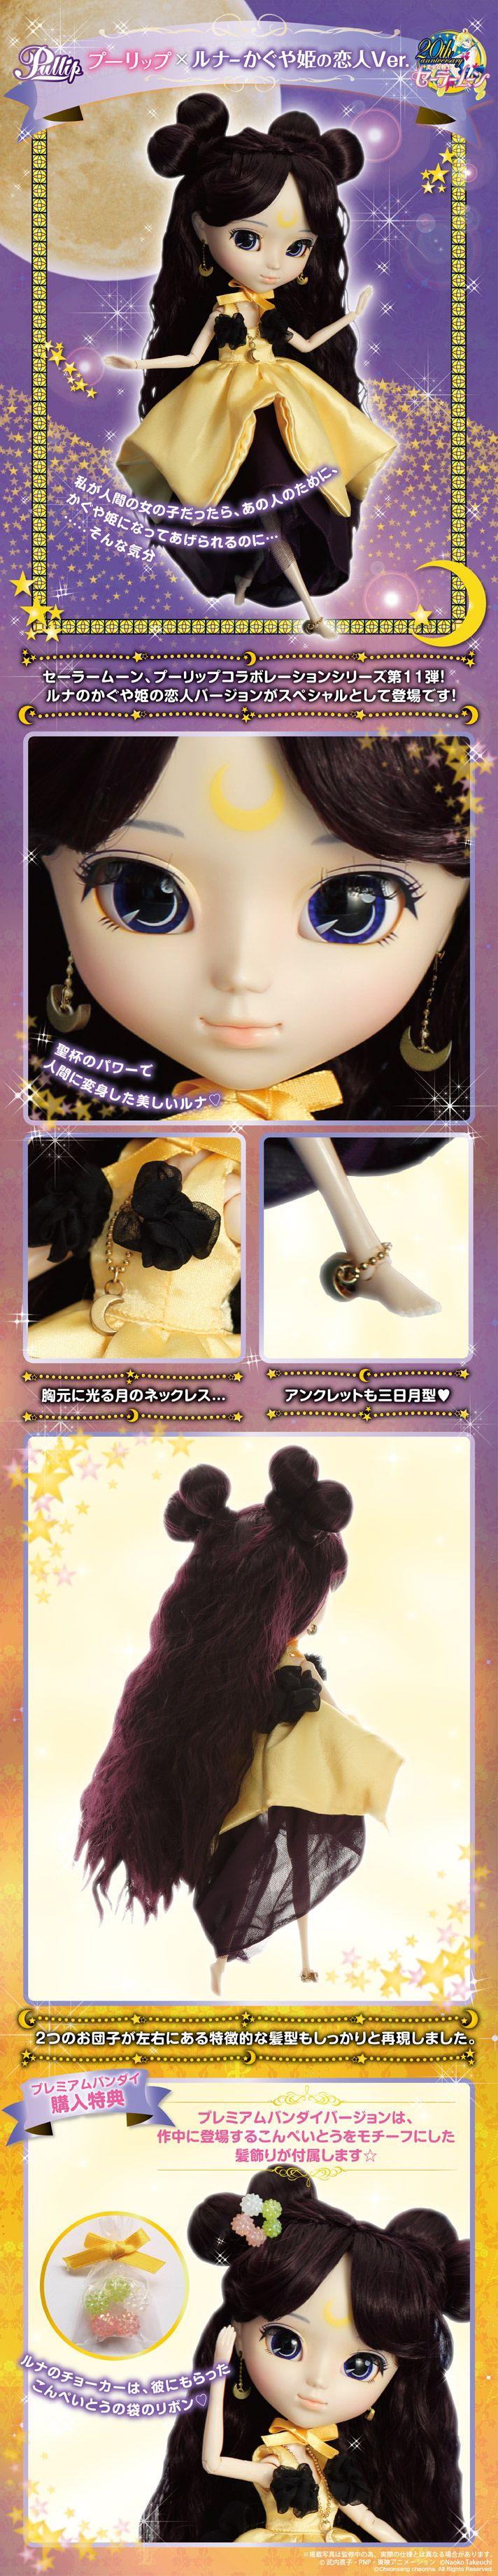 Sailor Moon News: Pullip Luna Princess Lover from Premium Bandai is here! - A Rinkya Blog